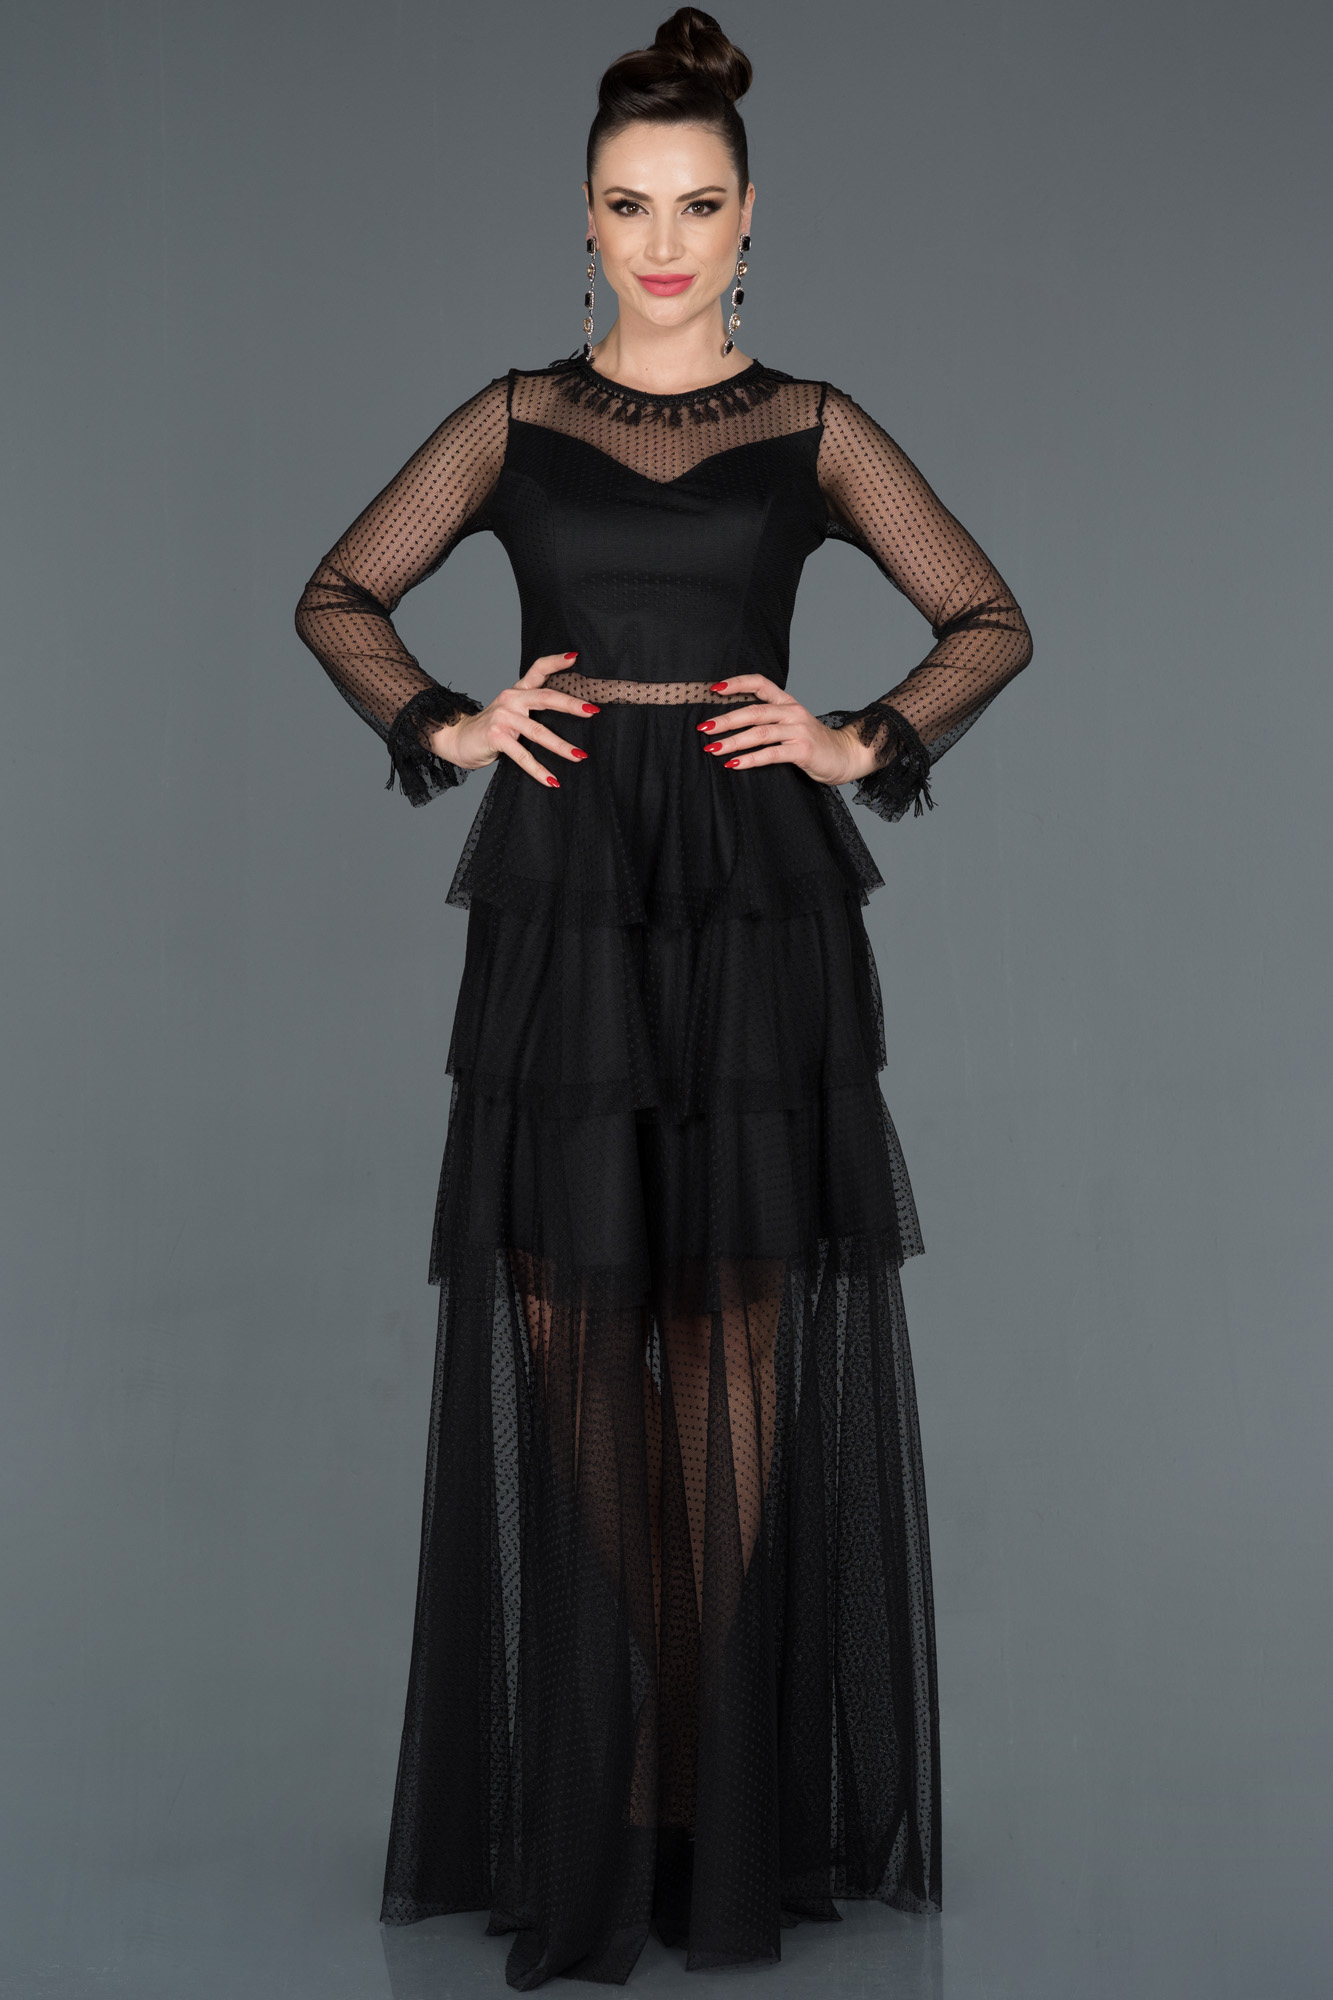 Siyah Transparan Uzun Kollu Tül Abiye Elbise